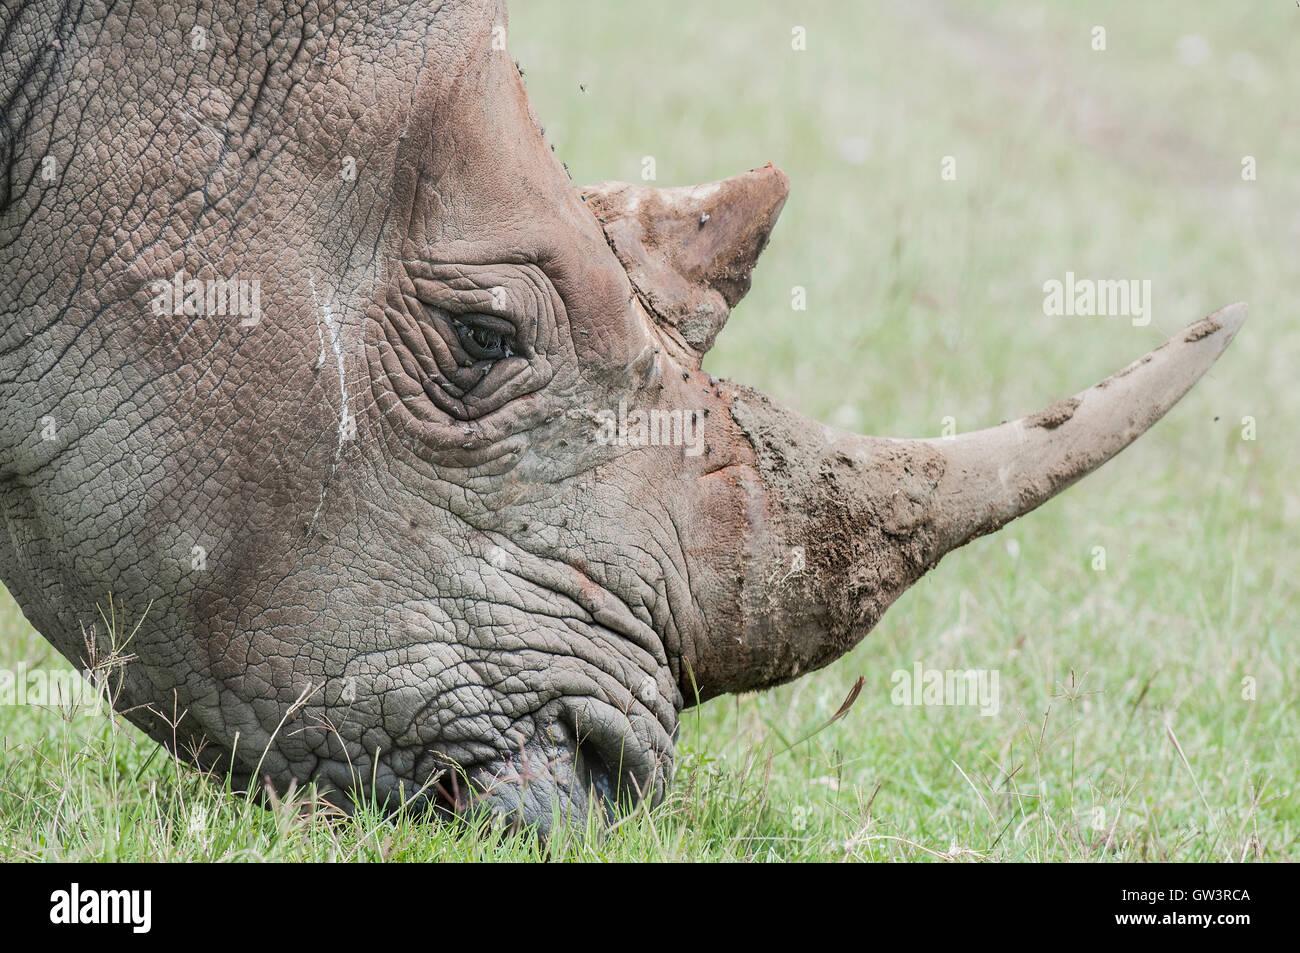 Close up of Rhinoceros. - Stock Image